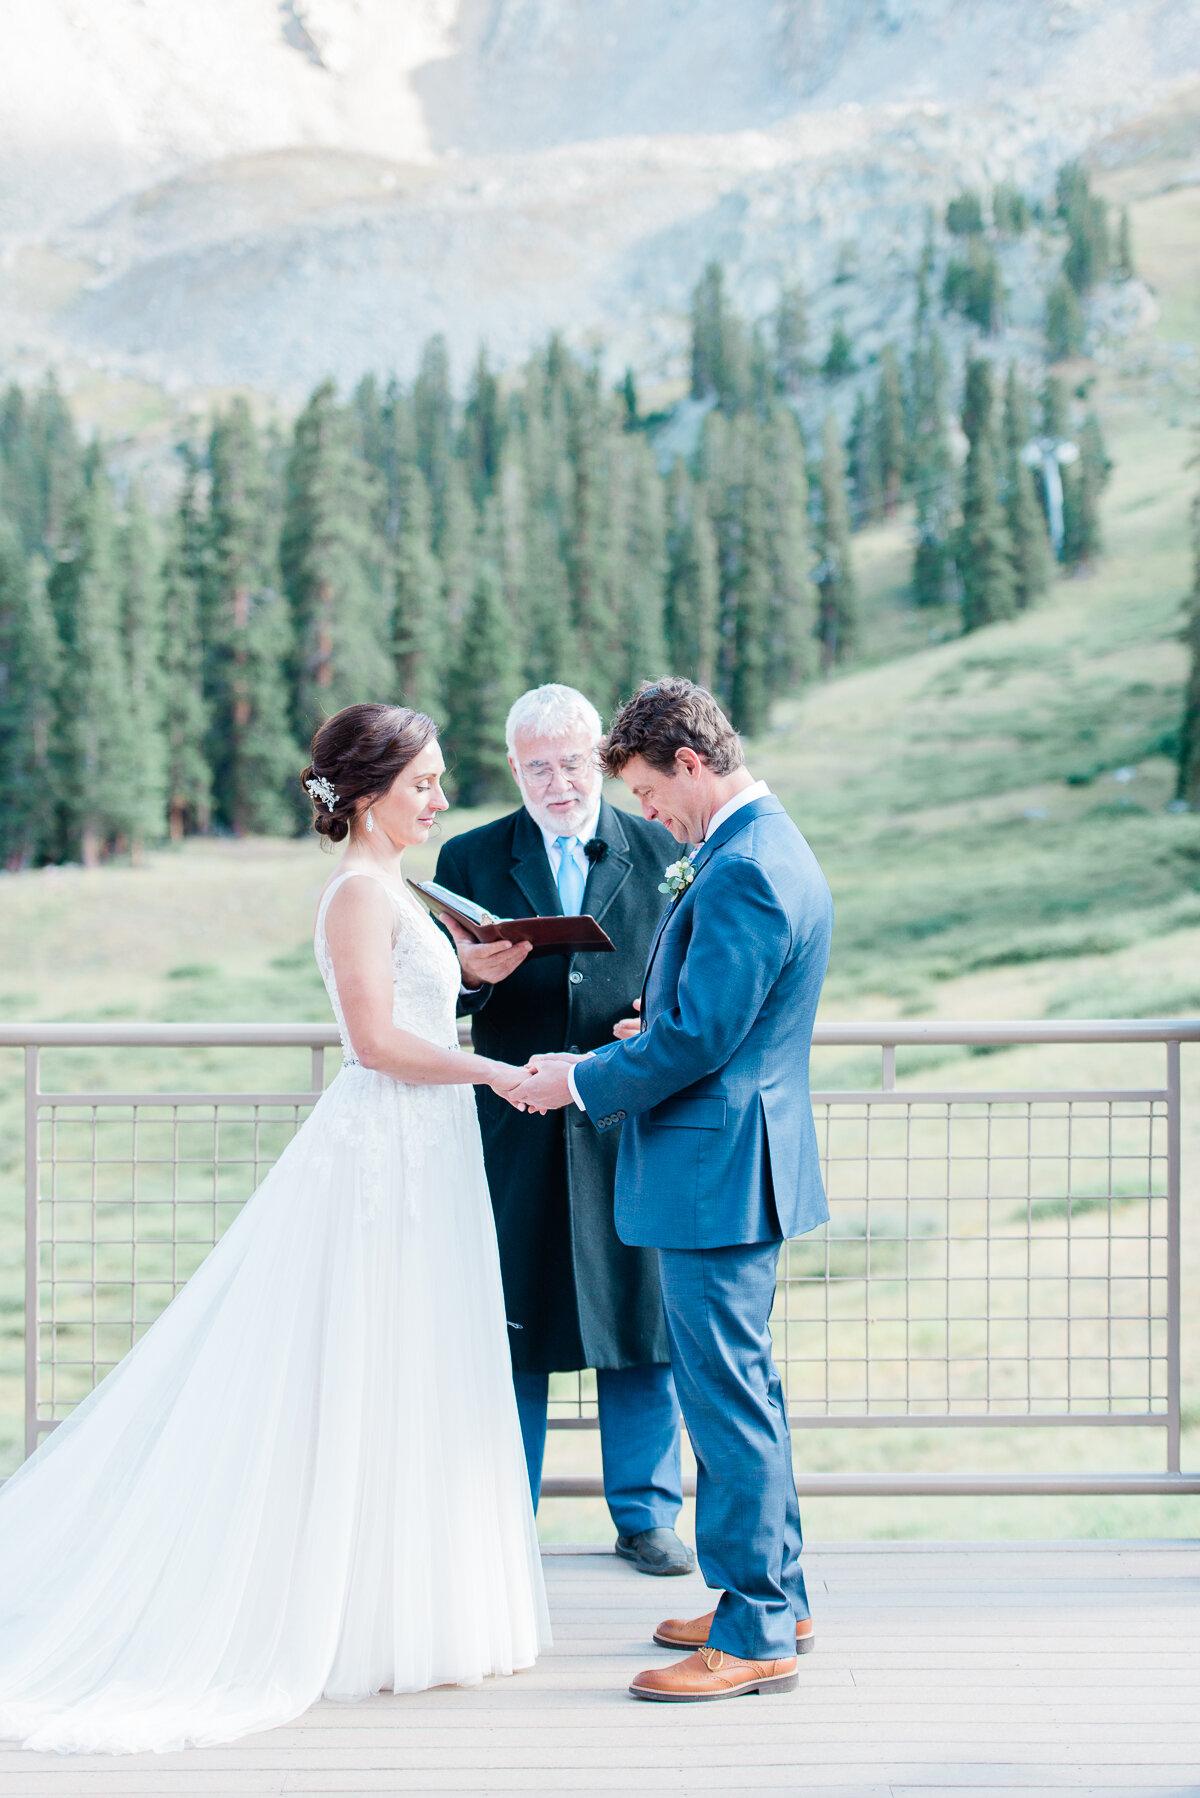 AshleighMillerPhotography-Wedding-Natalia-Matt-ArapahoeBasin-Colorado-27.jpg